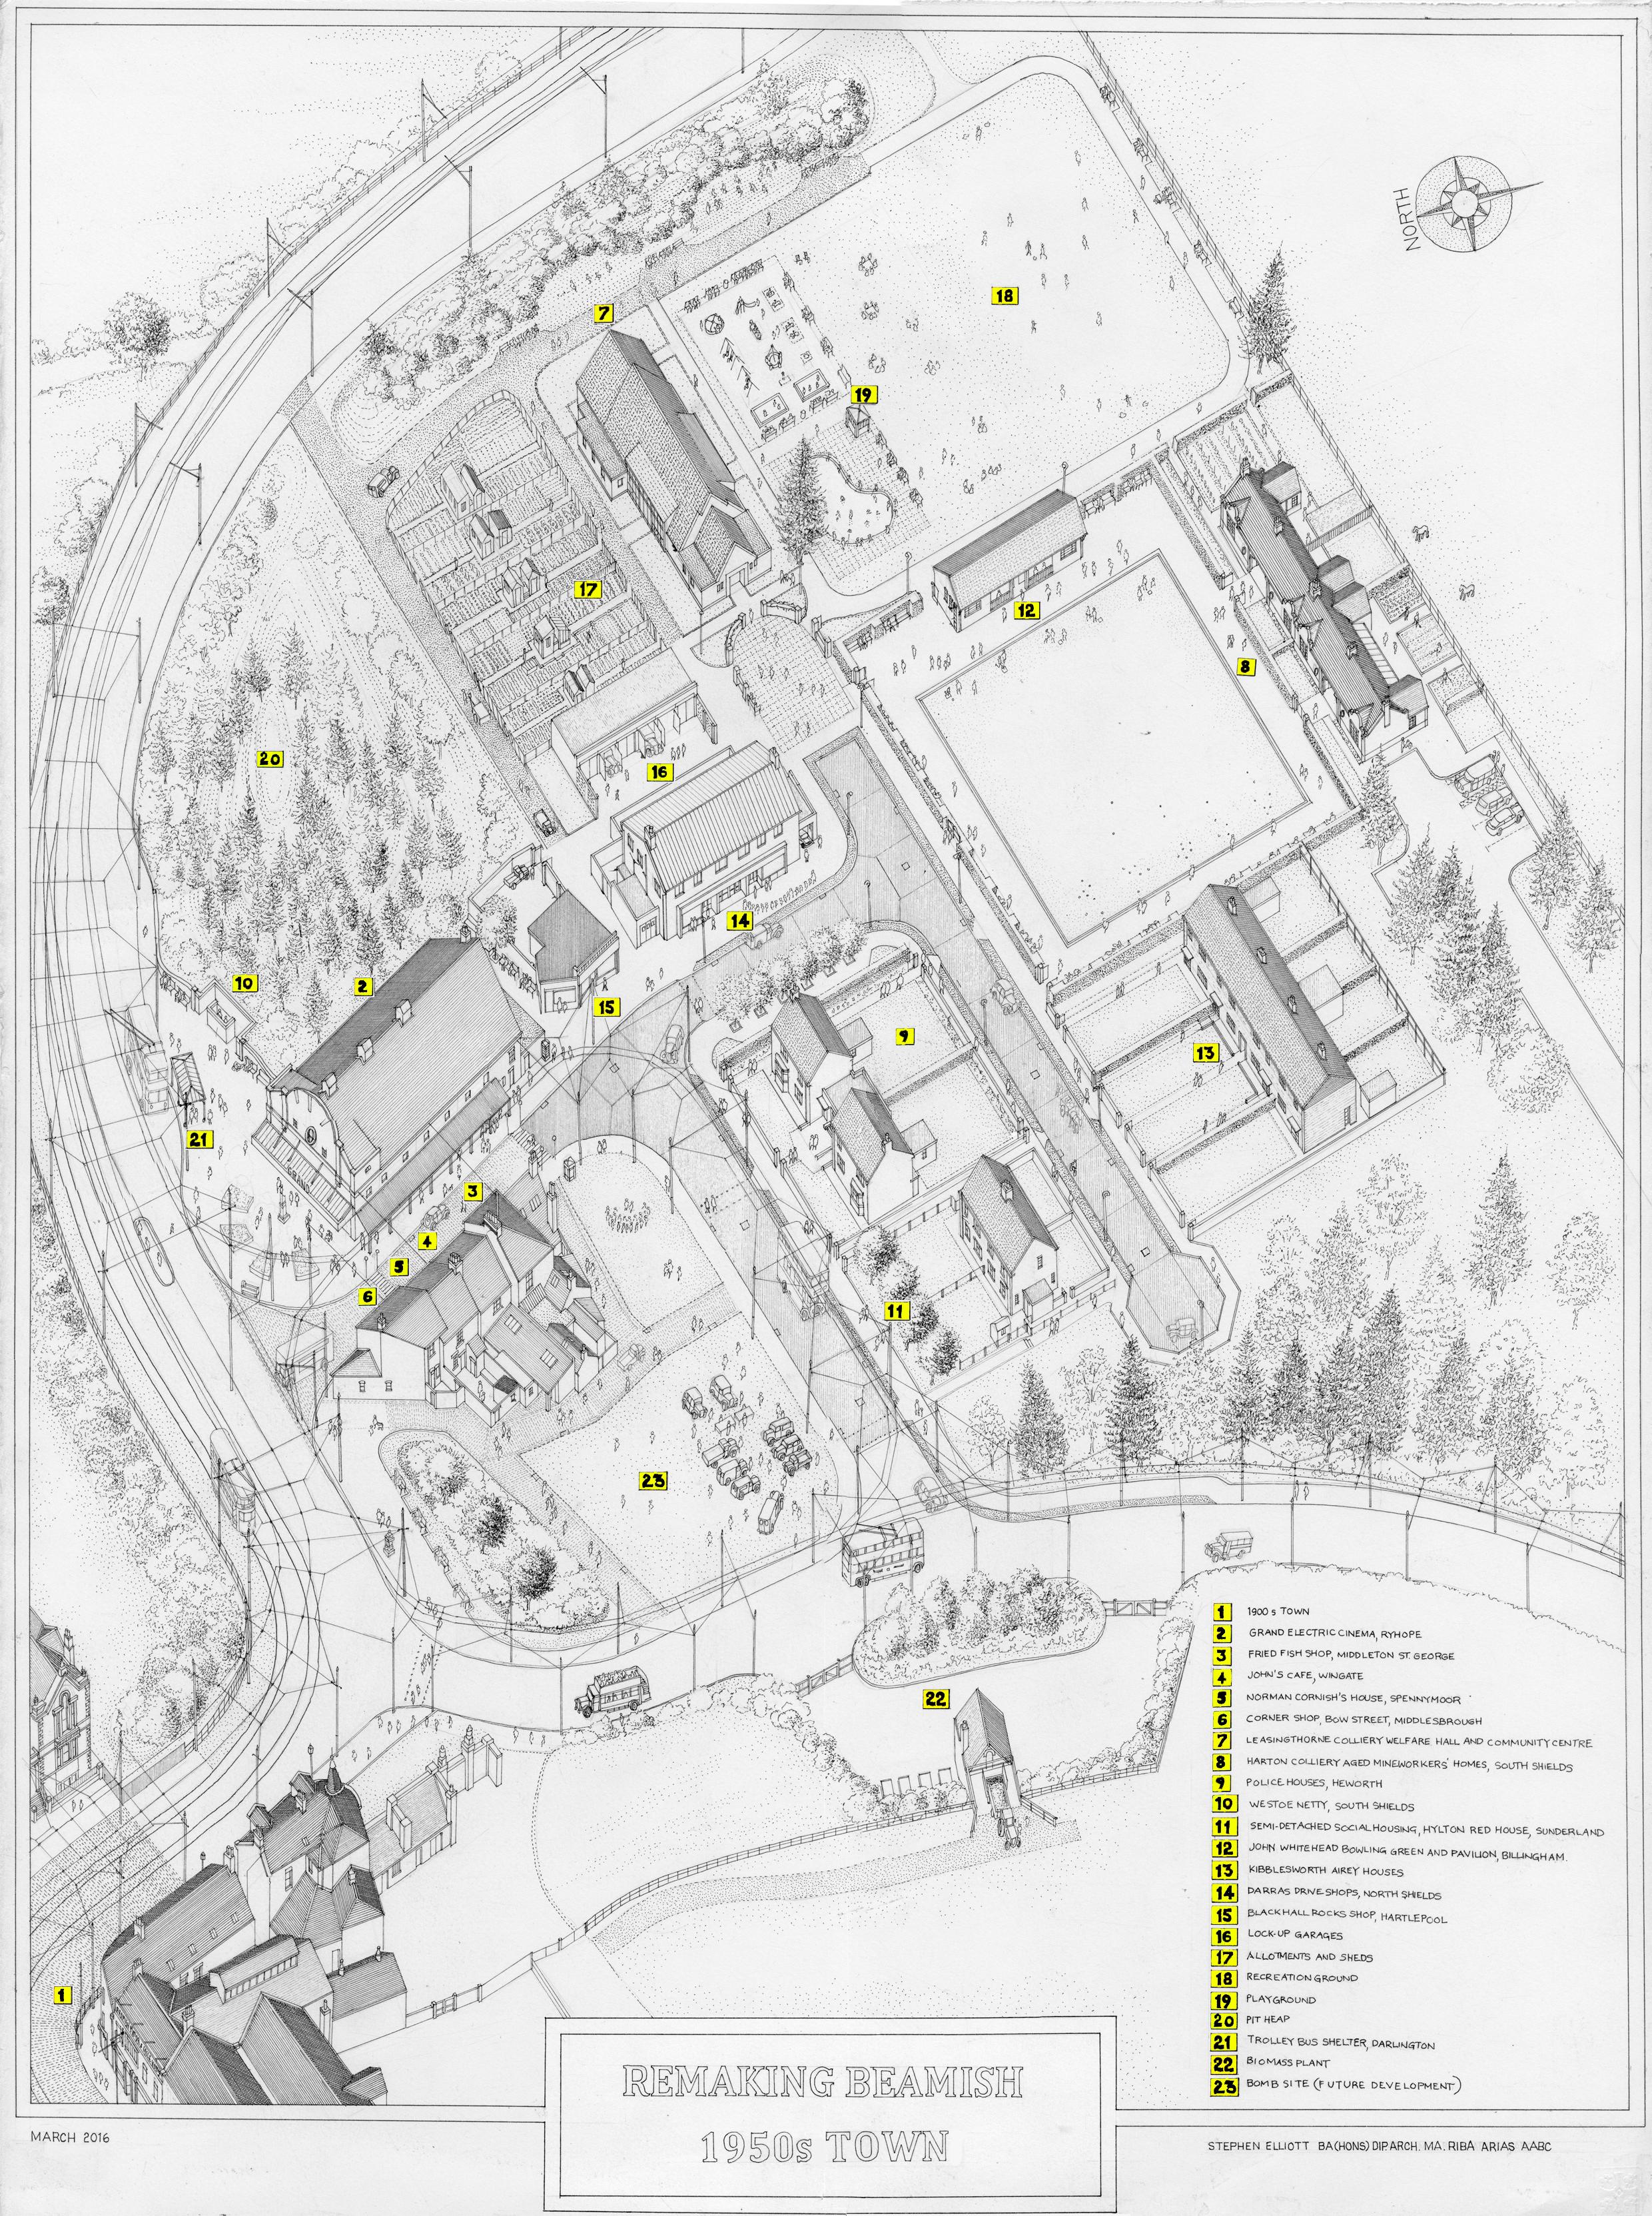 Beamish Museum's Remaking Beamish 1950s Town Plan[1]